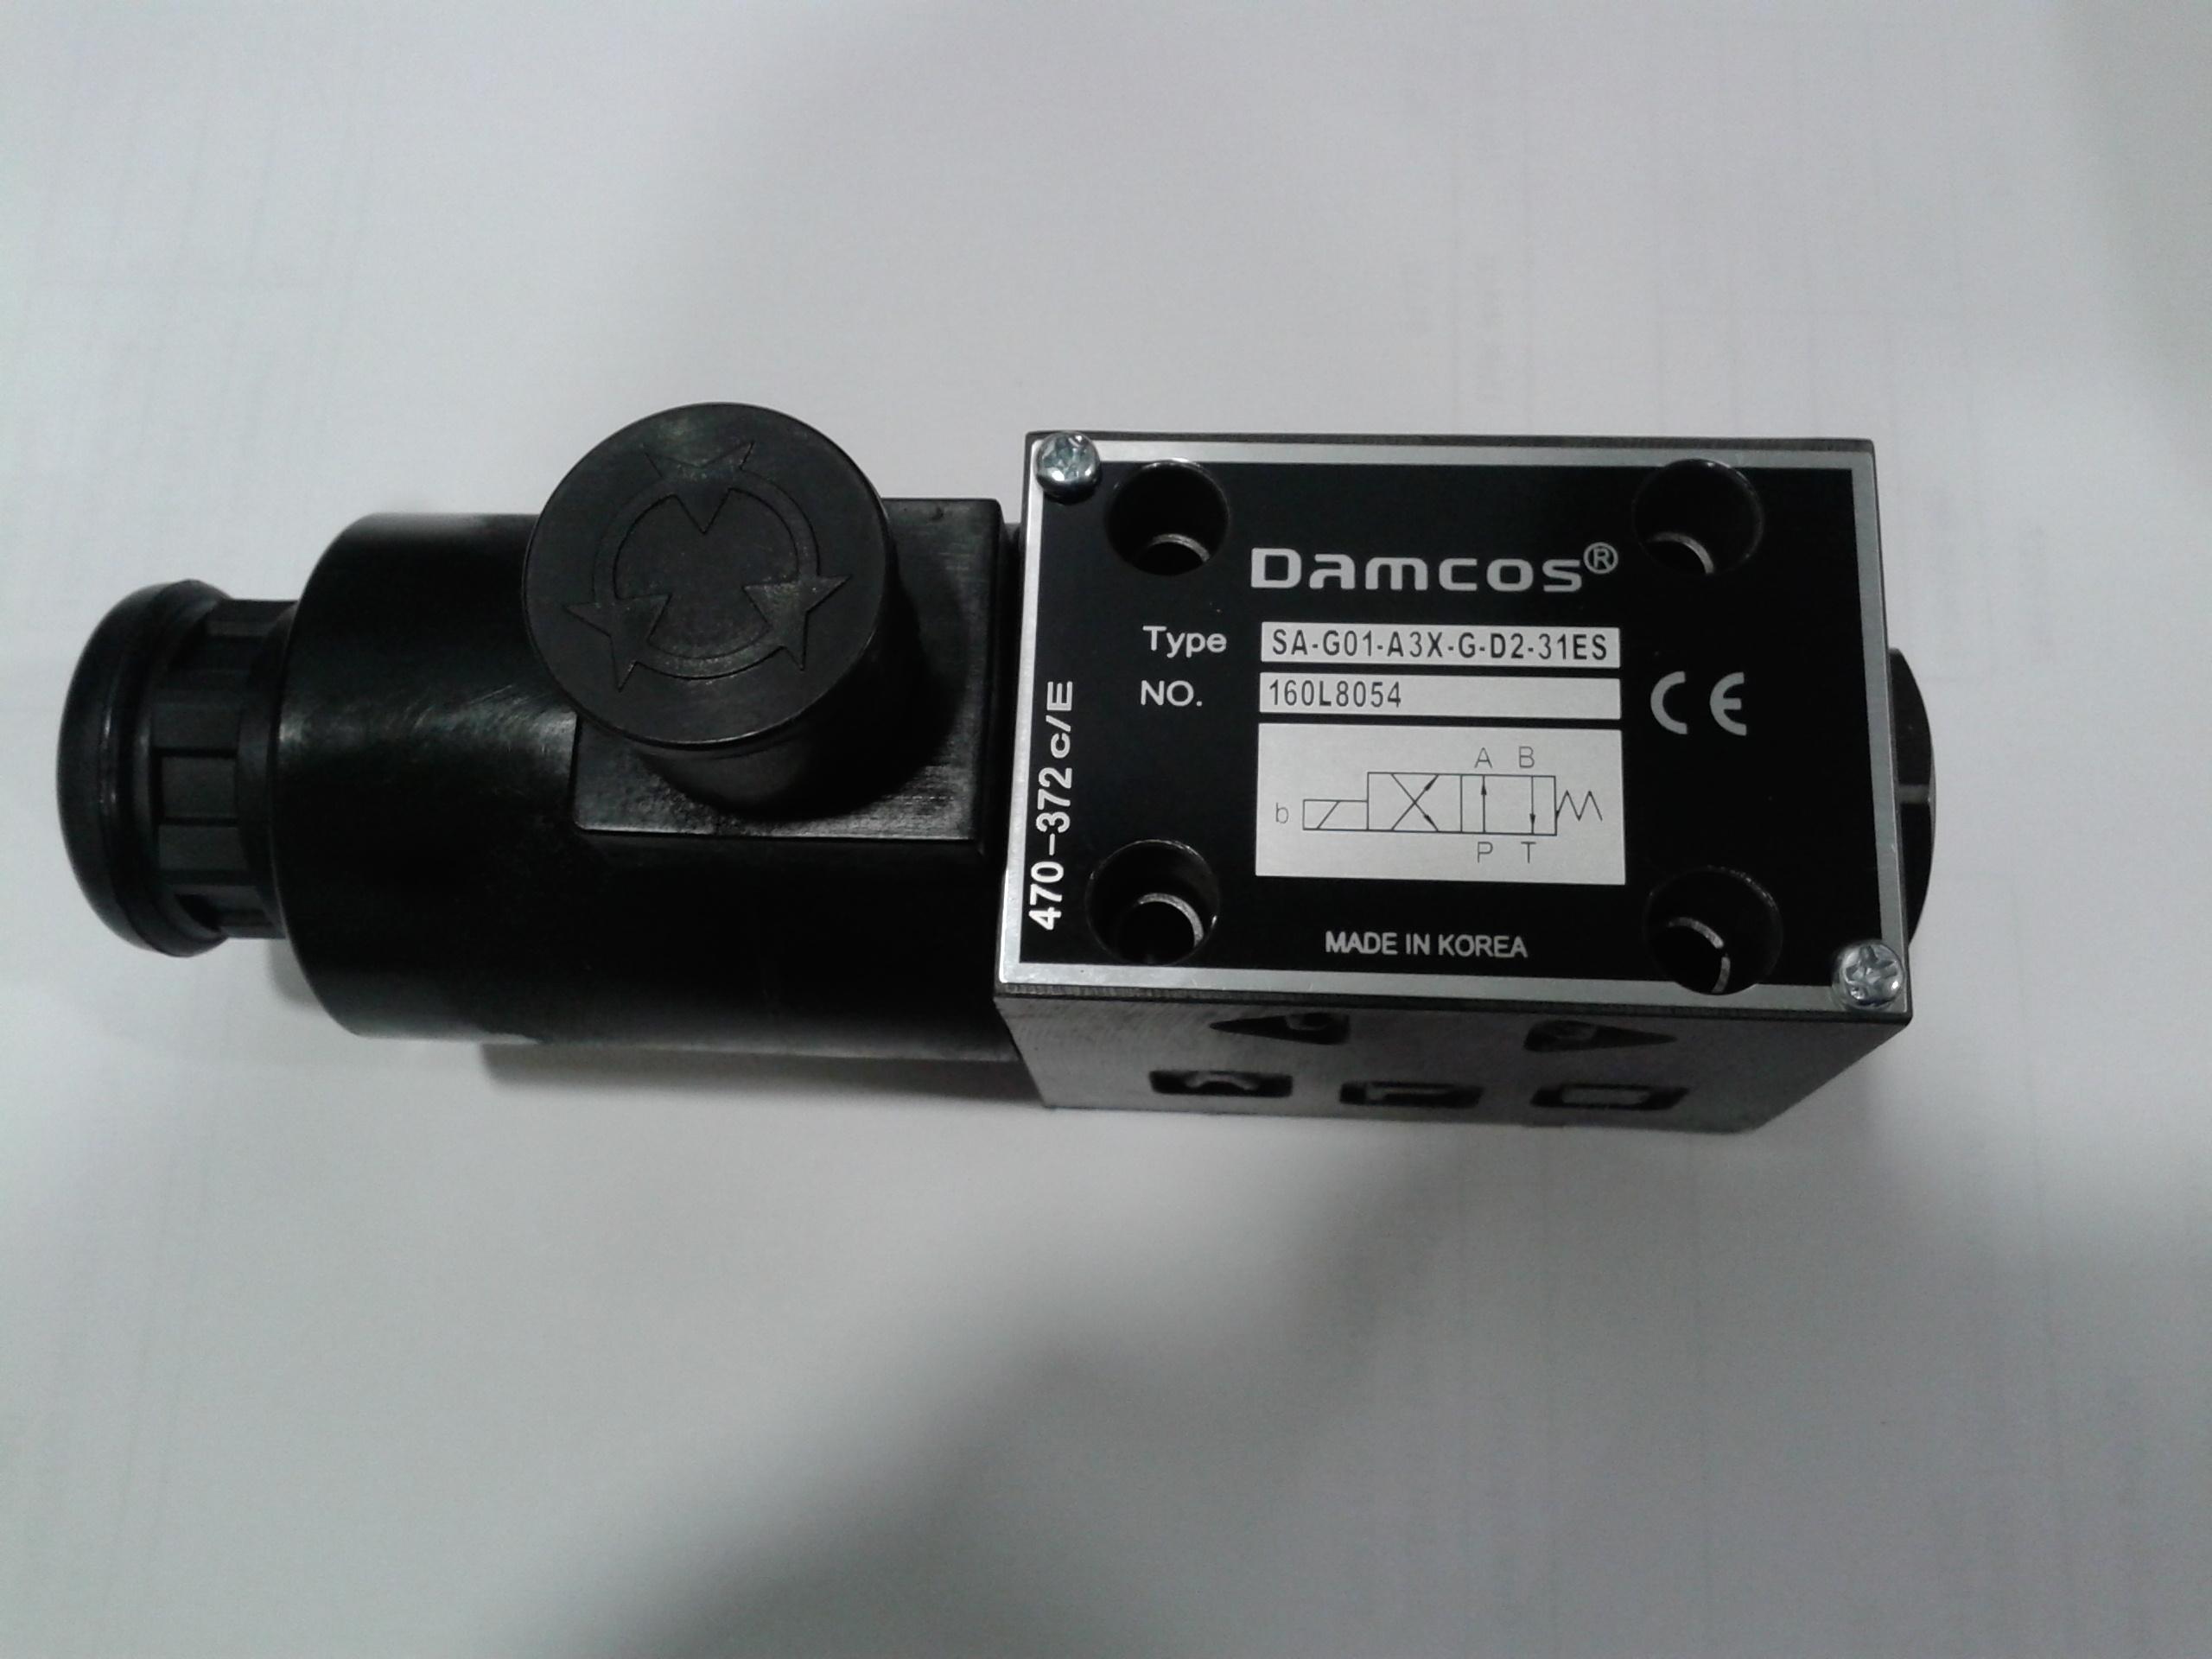 Damcos-Danfoss-Solenoid-Valve-SA-G01-A3X-G-D2-31ES-160L8054-